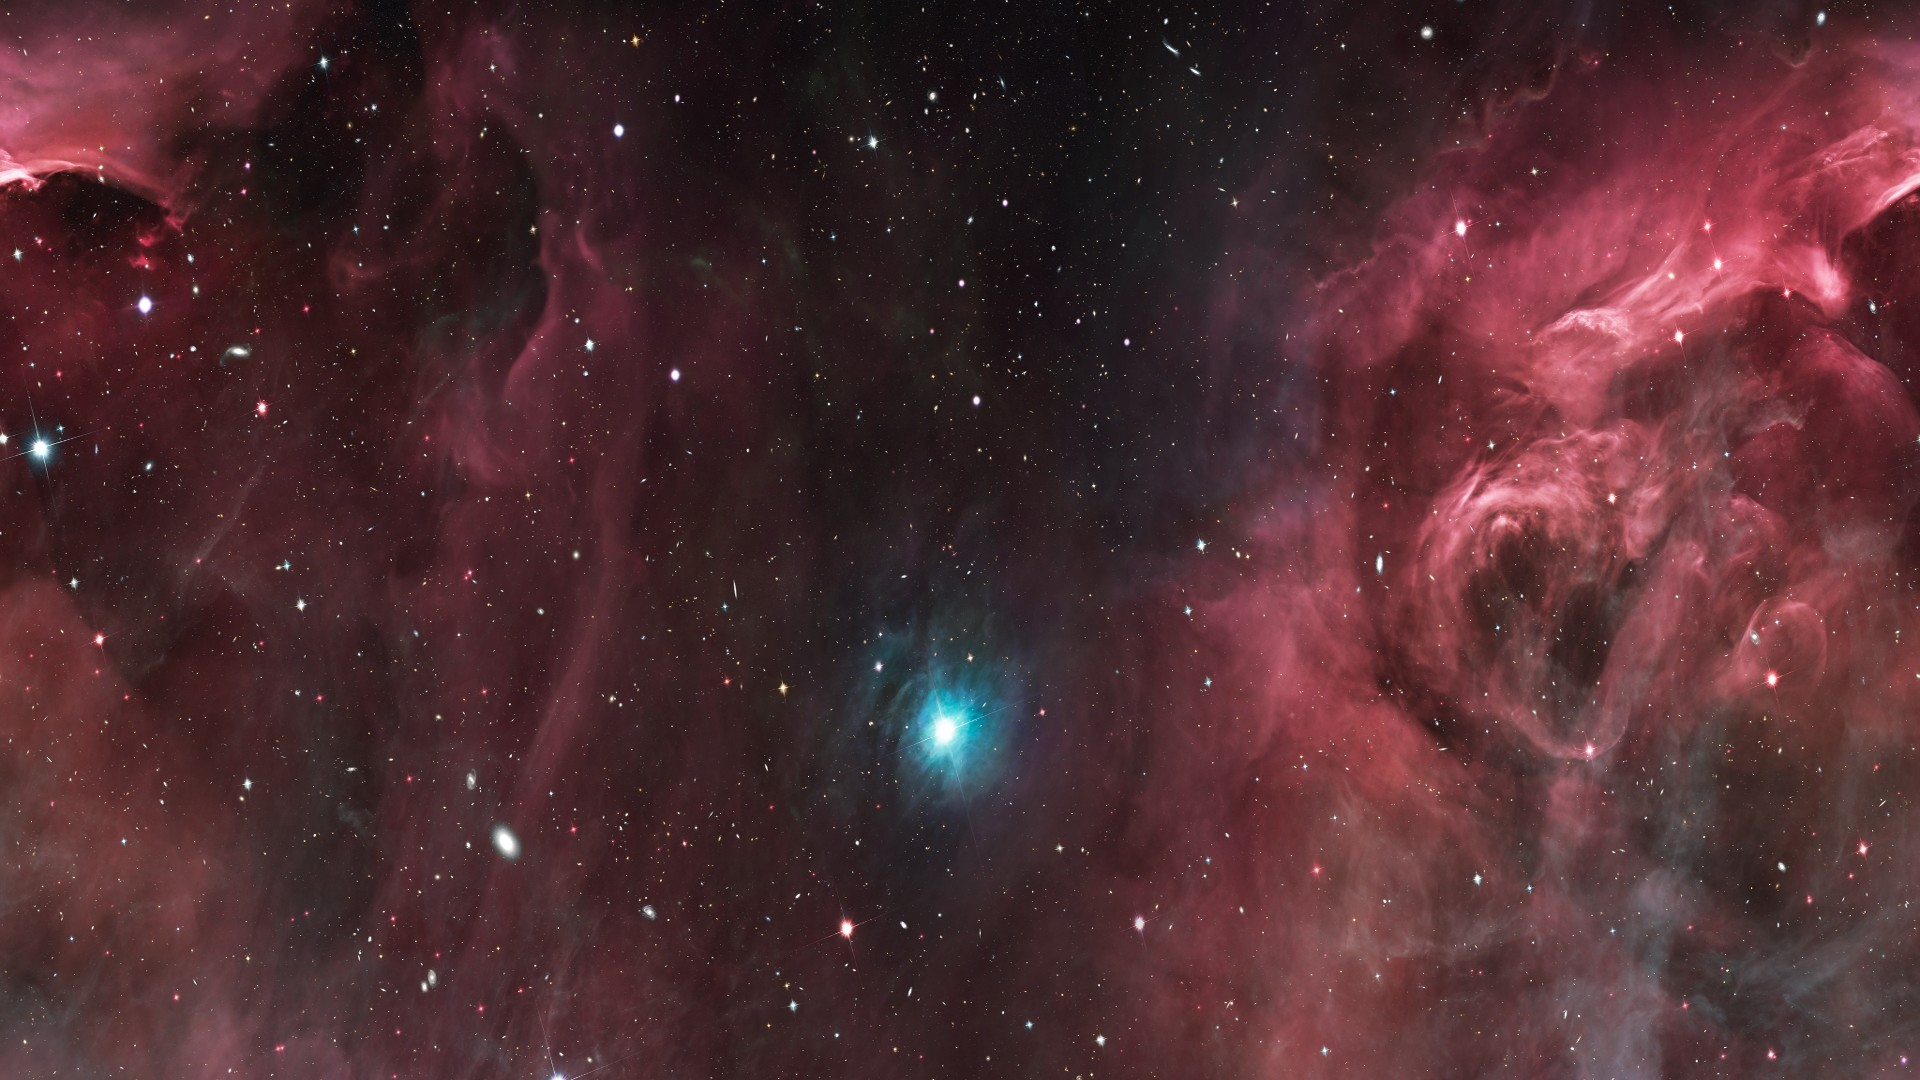 Orion Nebula Wallpaper Widescreen Orion nebula wallpaper